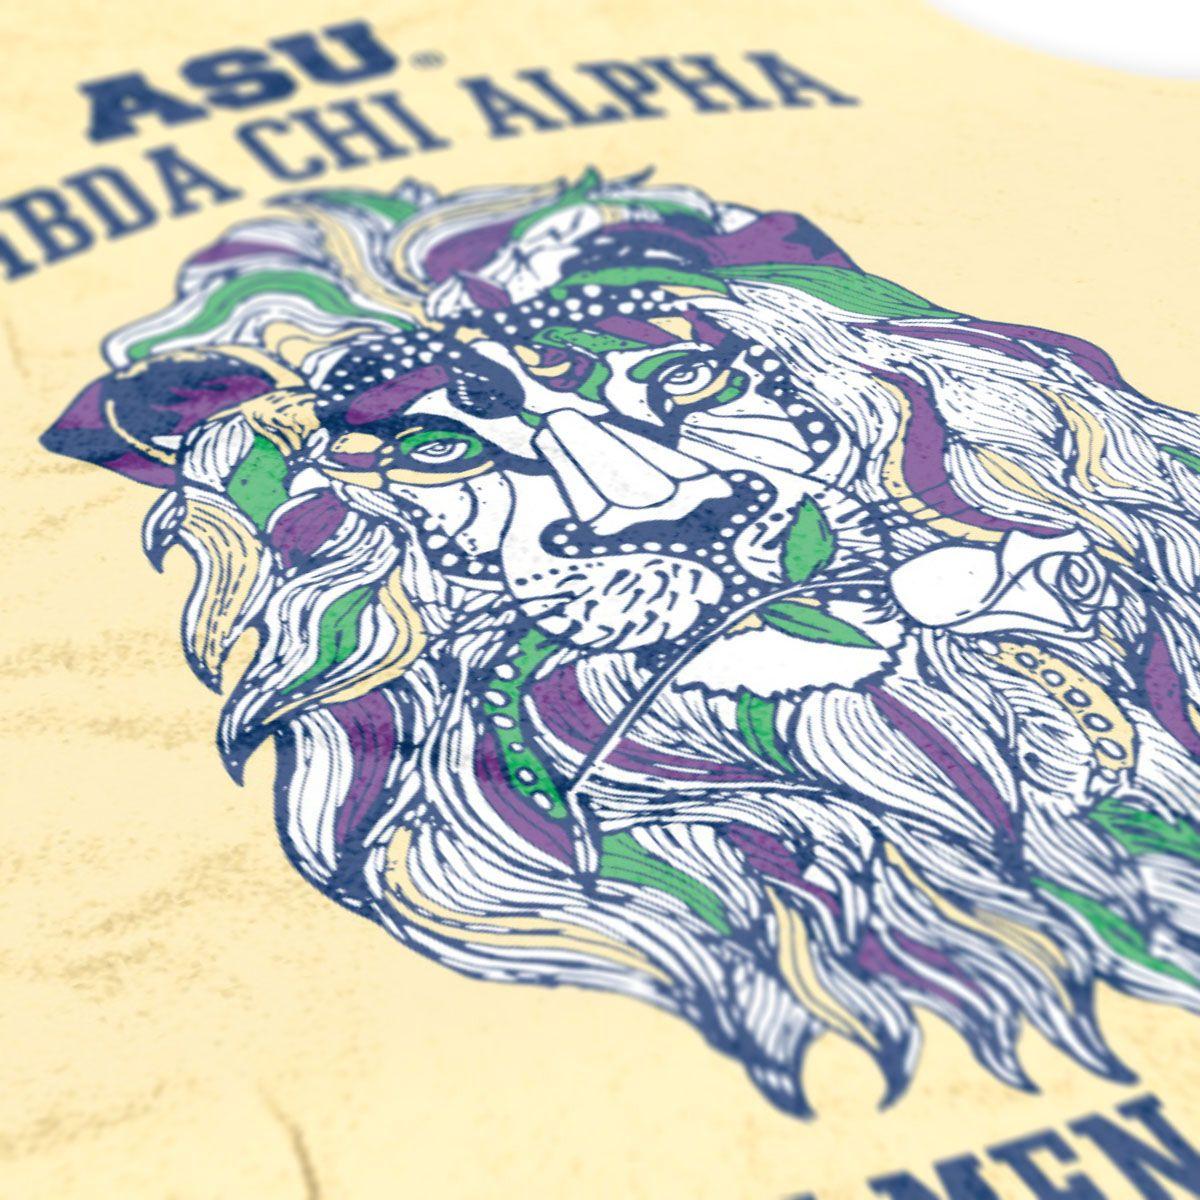 Art Unlimited Sportswear: Fraternity Tshirts